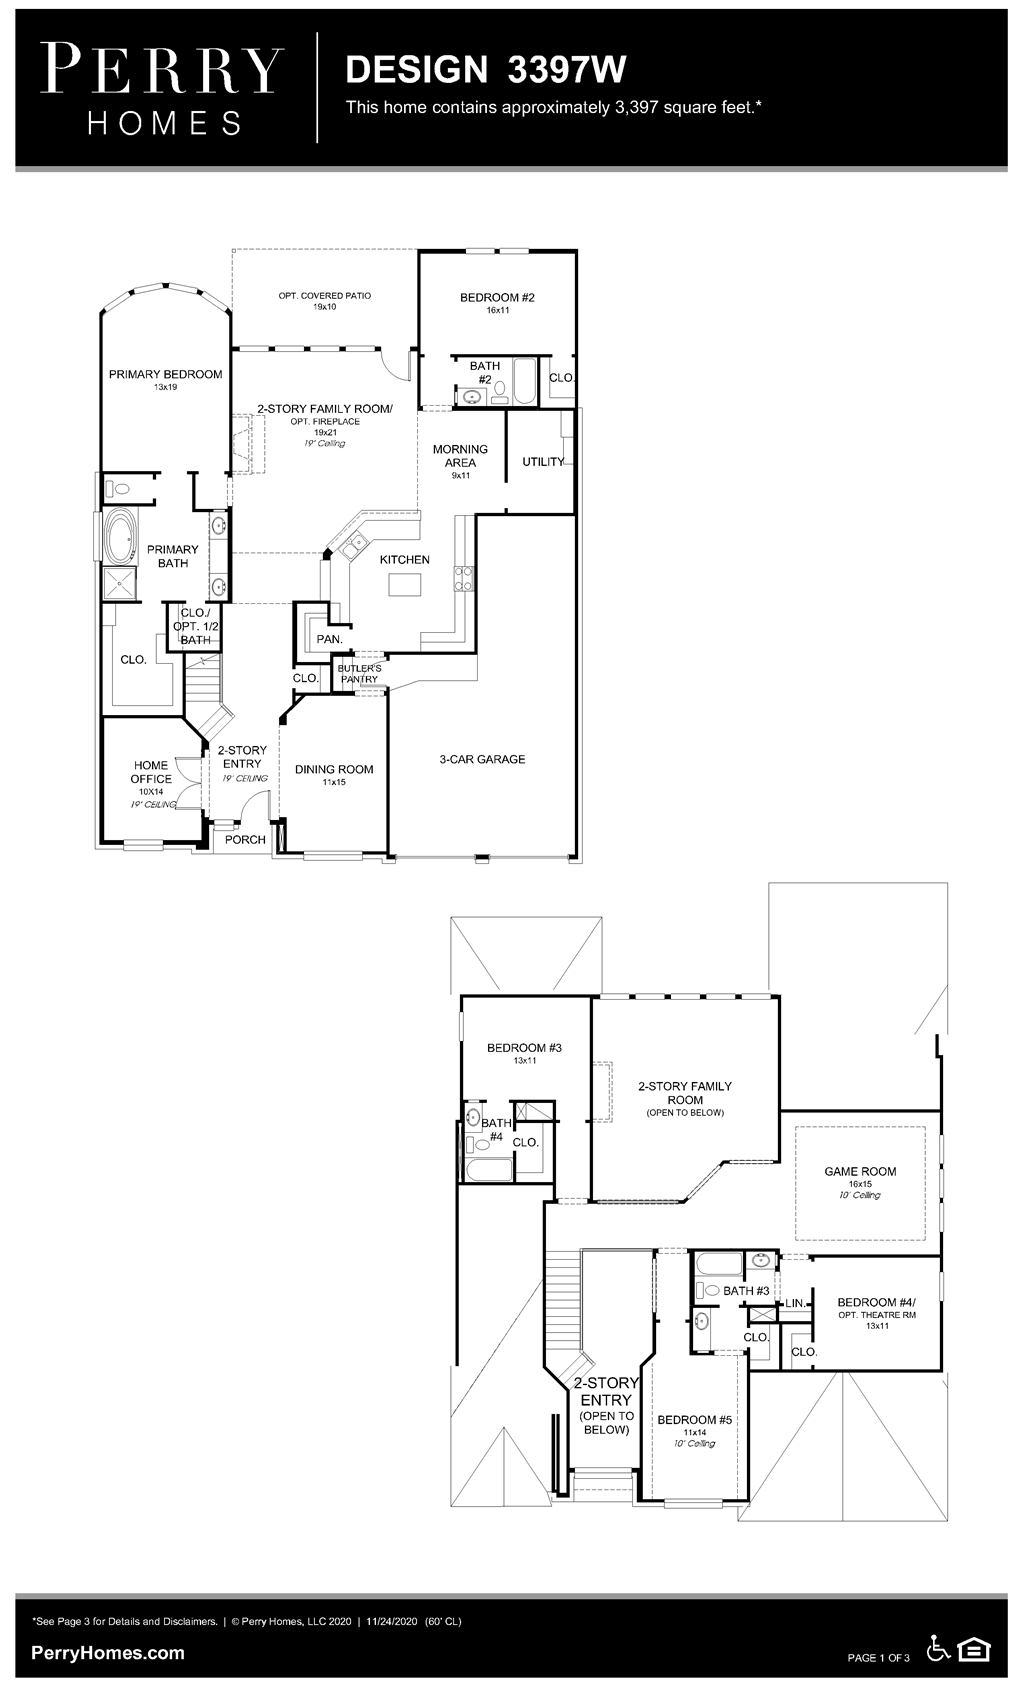 Floor Plan for 3397W